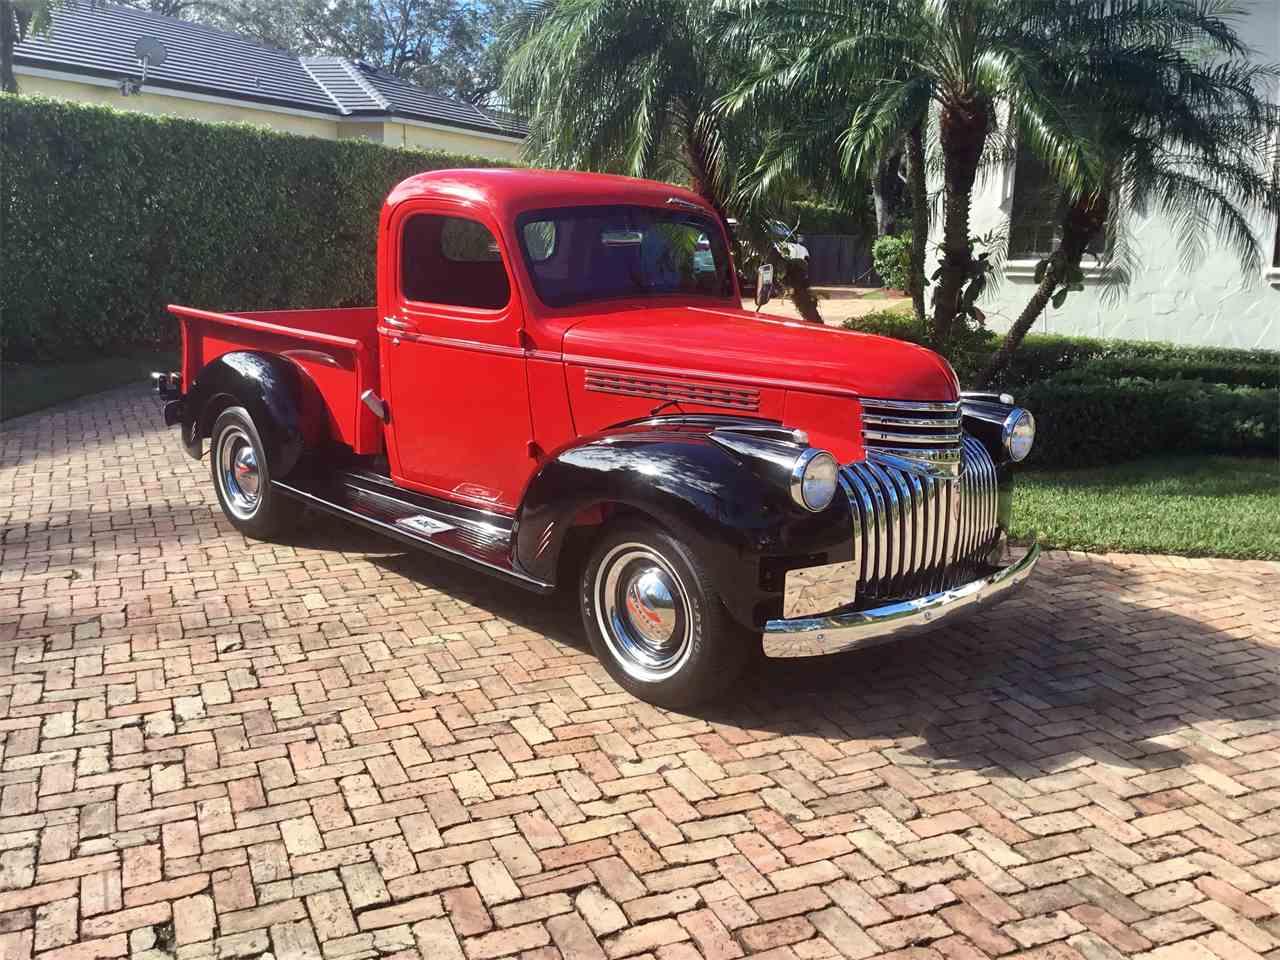 1946 Chevrolet Pickup for Sale   ClassicCars.com   CC-1054434